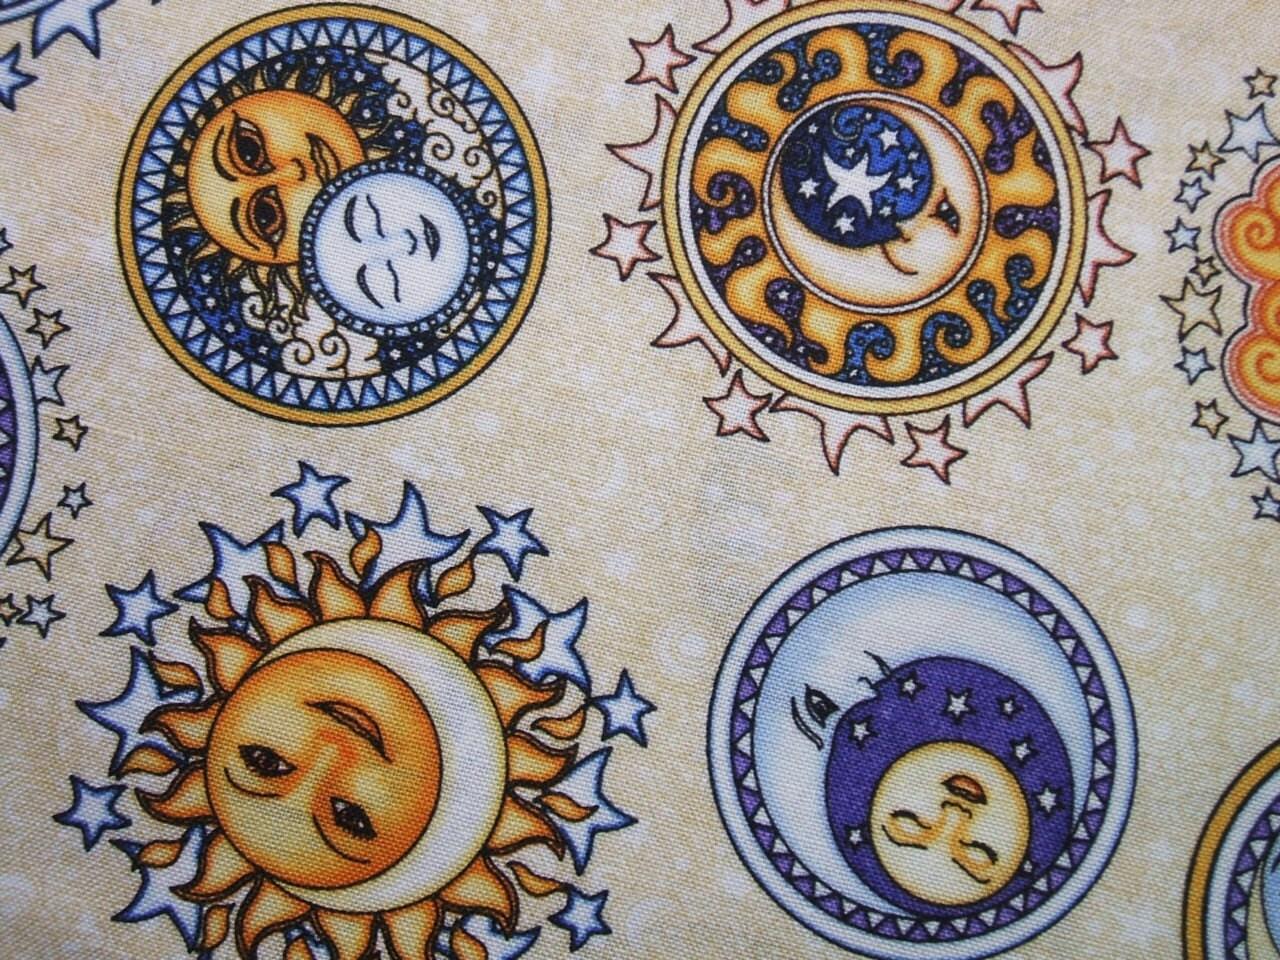 Rjr sew heavenly cream celestial sun moon by for Sun and moon material